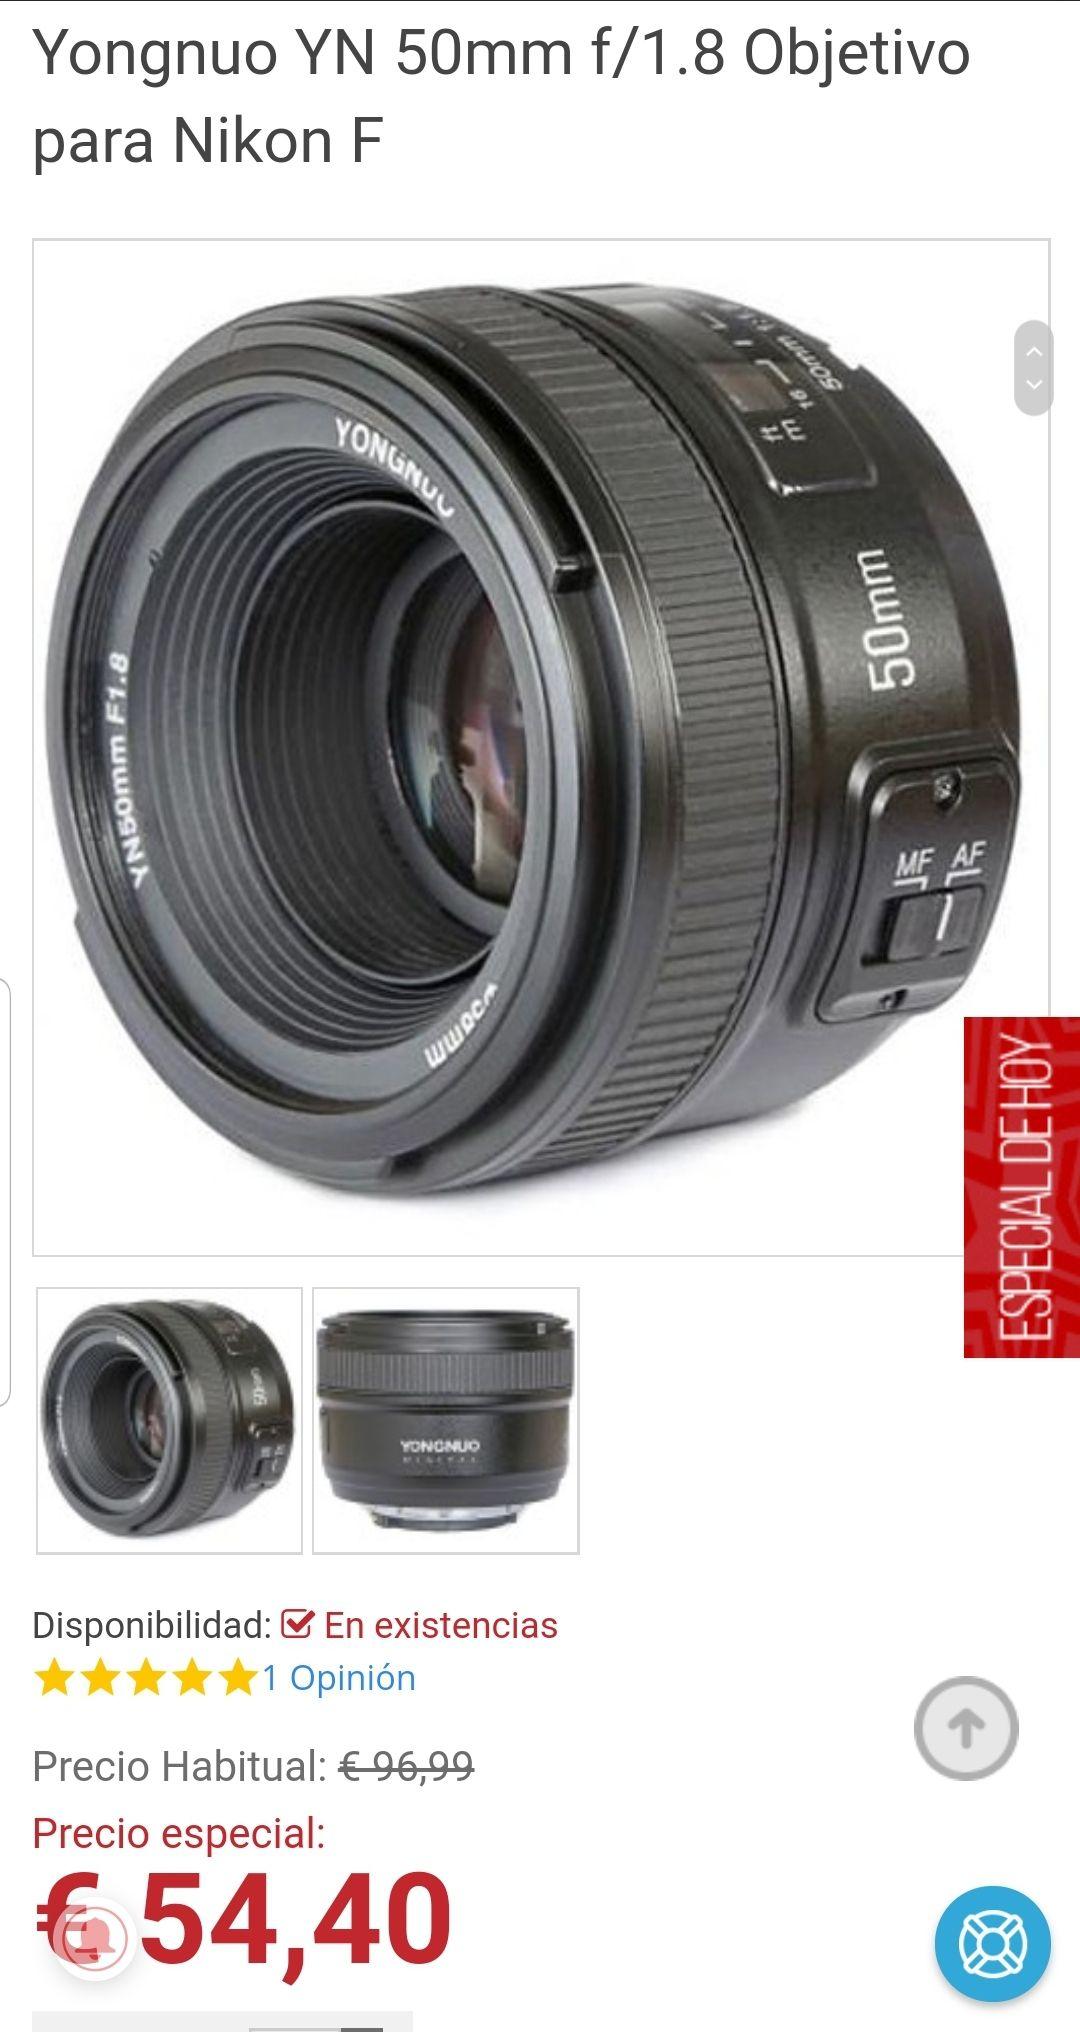 Objetivo YONGUO compatible con Nikon 50mm /1.8